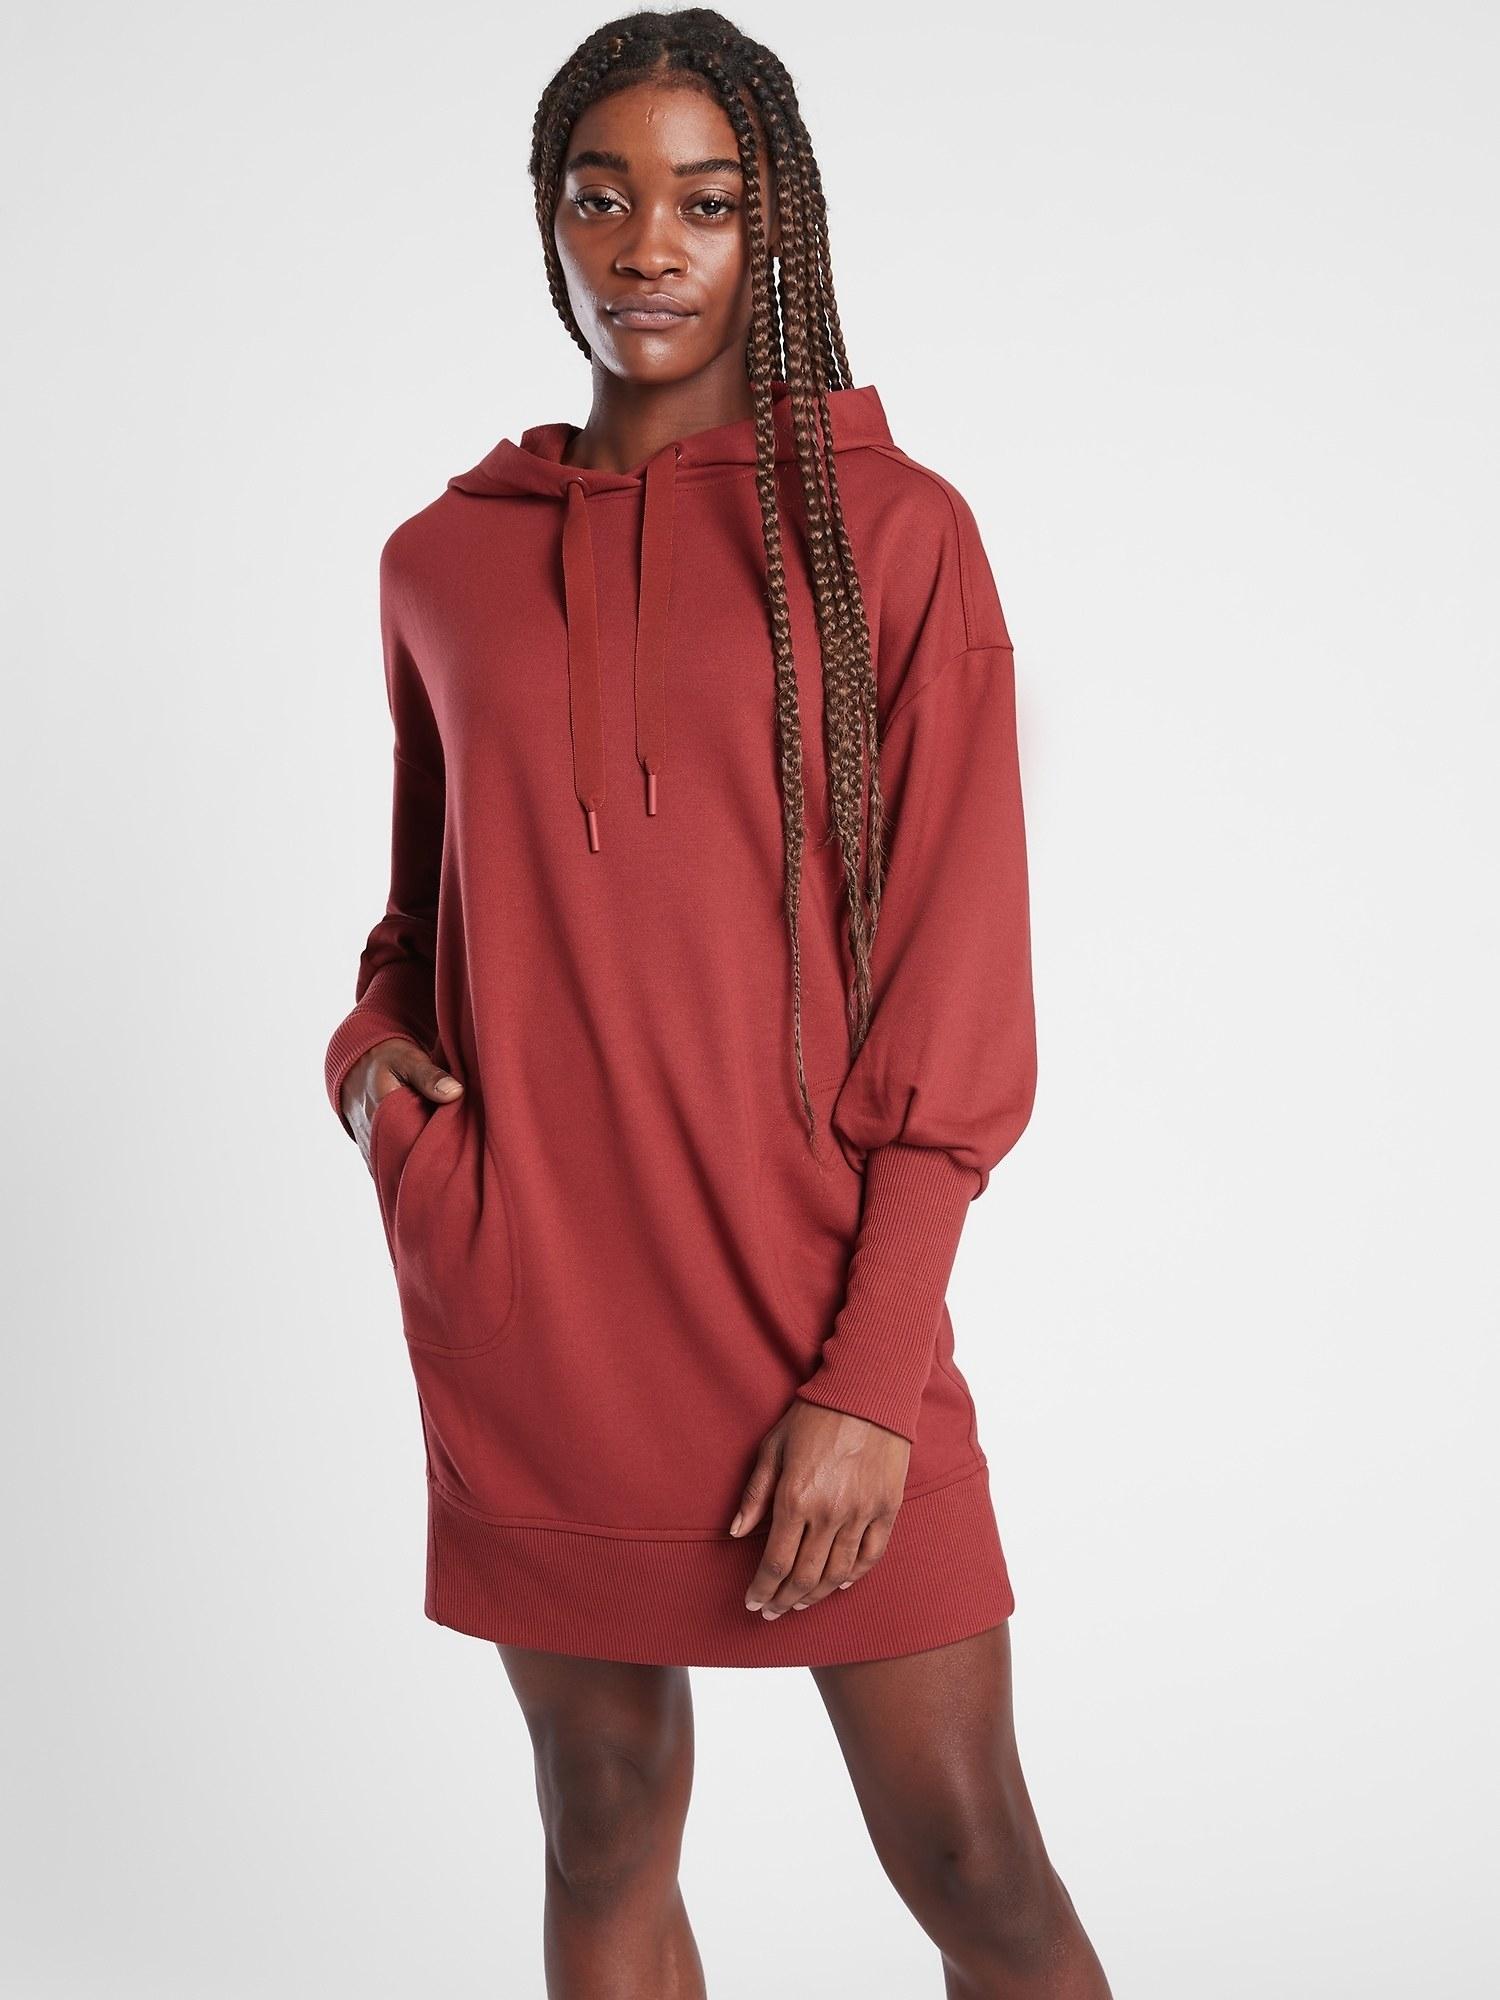 a model in a red long sleeve hoodie dress